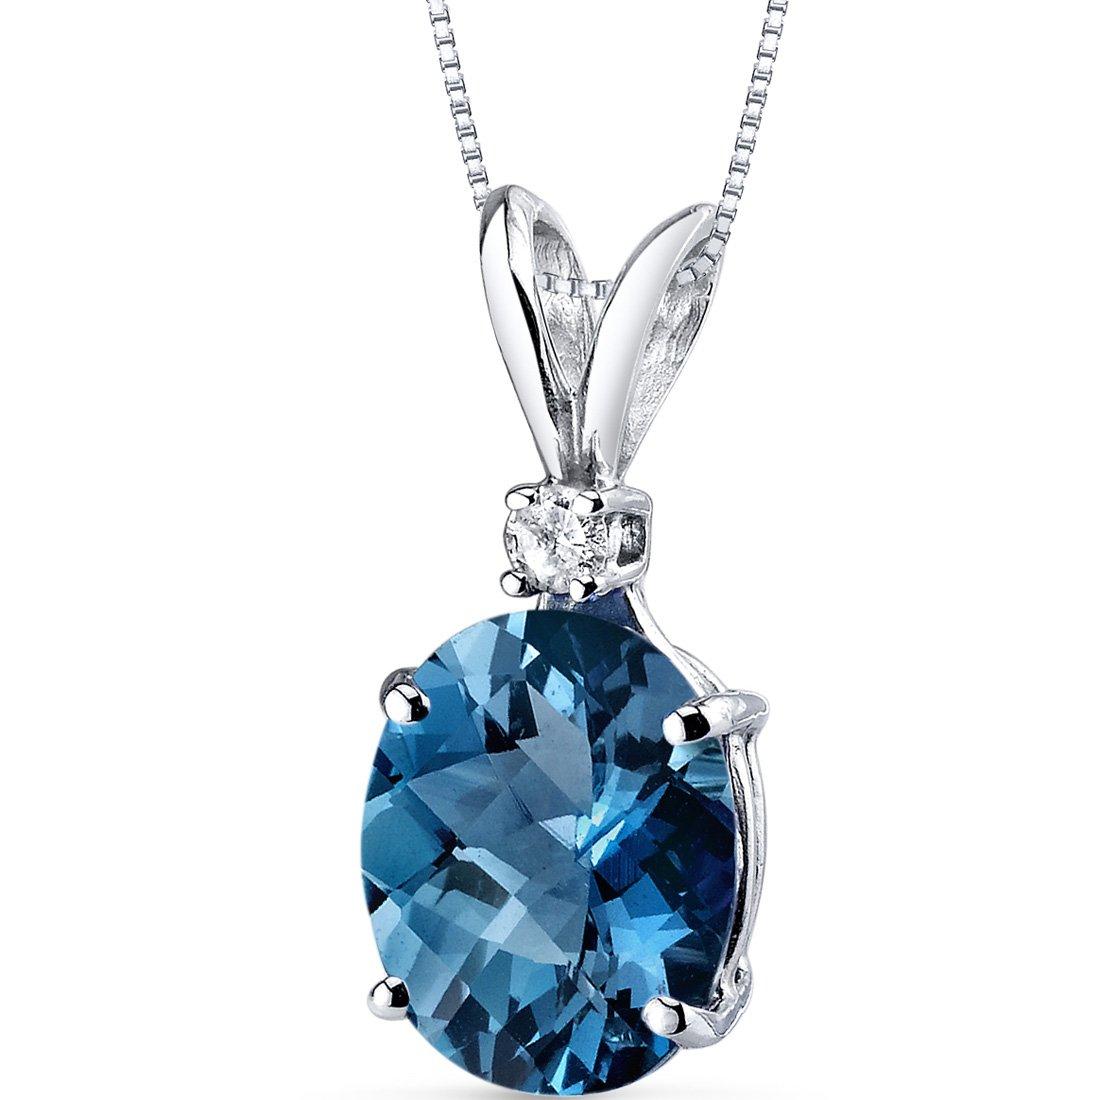 14 Karat White Gold Oval Shape 3.00 Carats London Blue Topaz Diamond Pendant by Peora (Image #1)